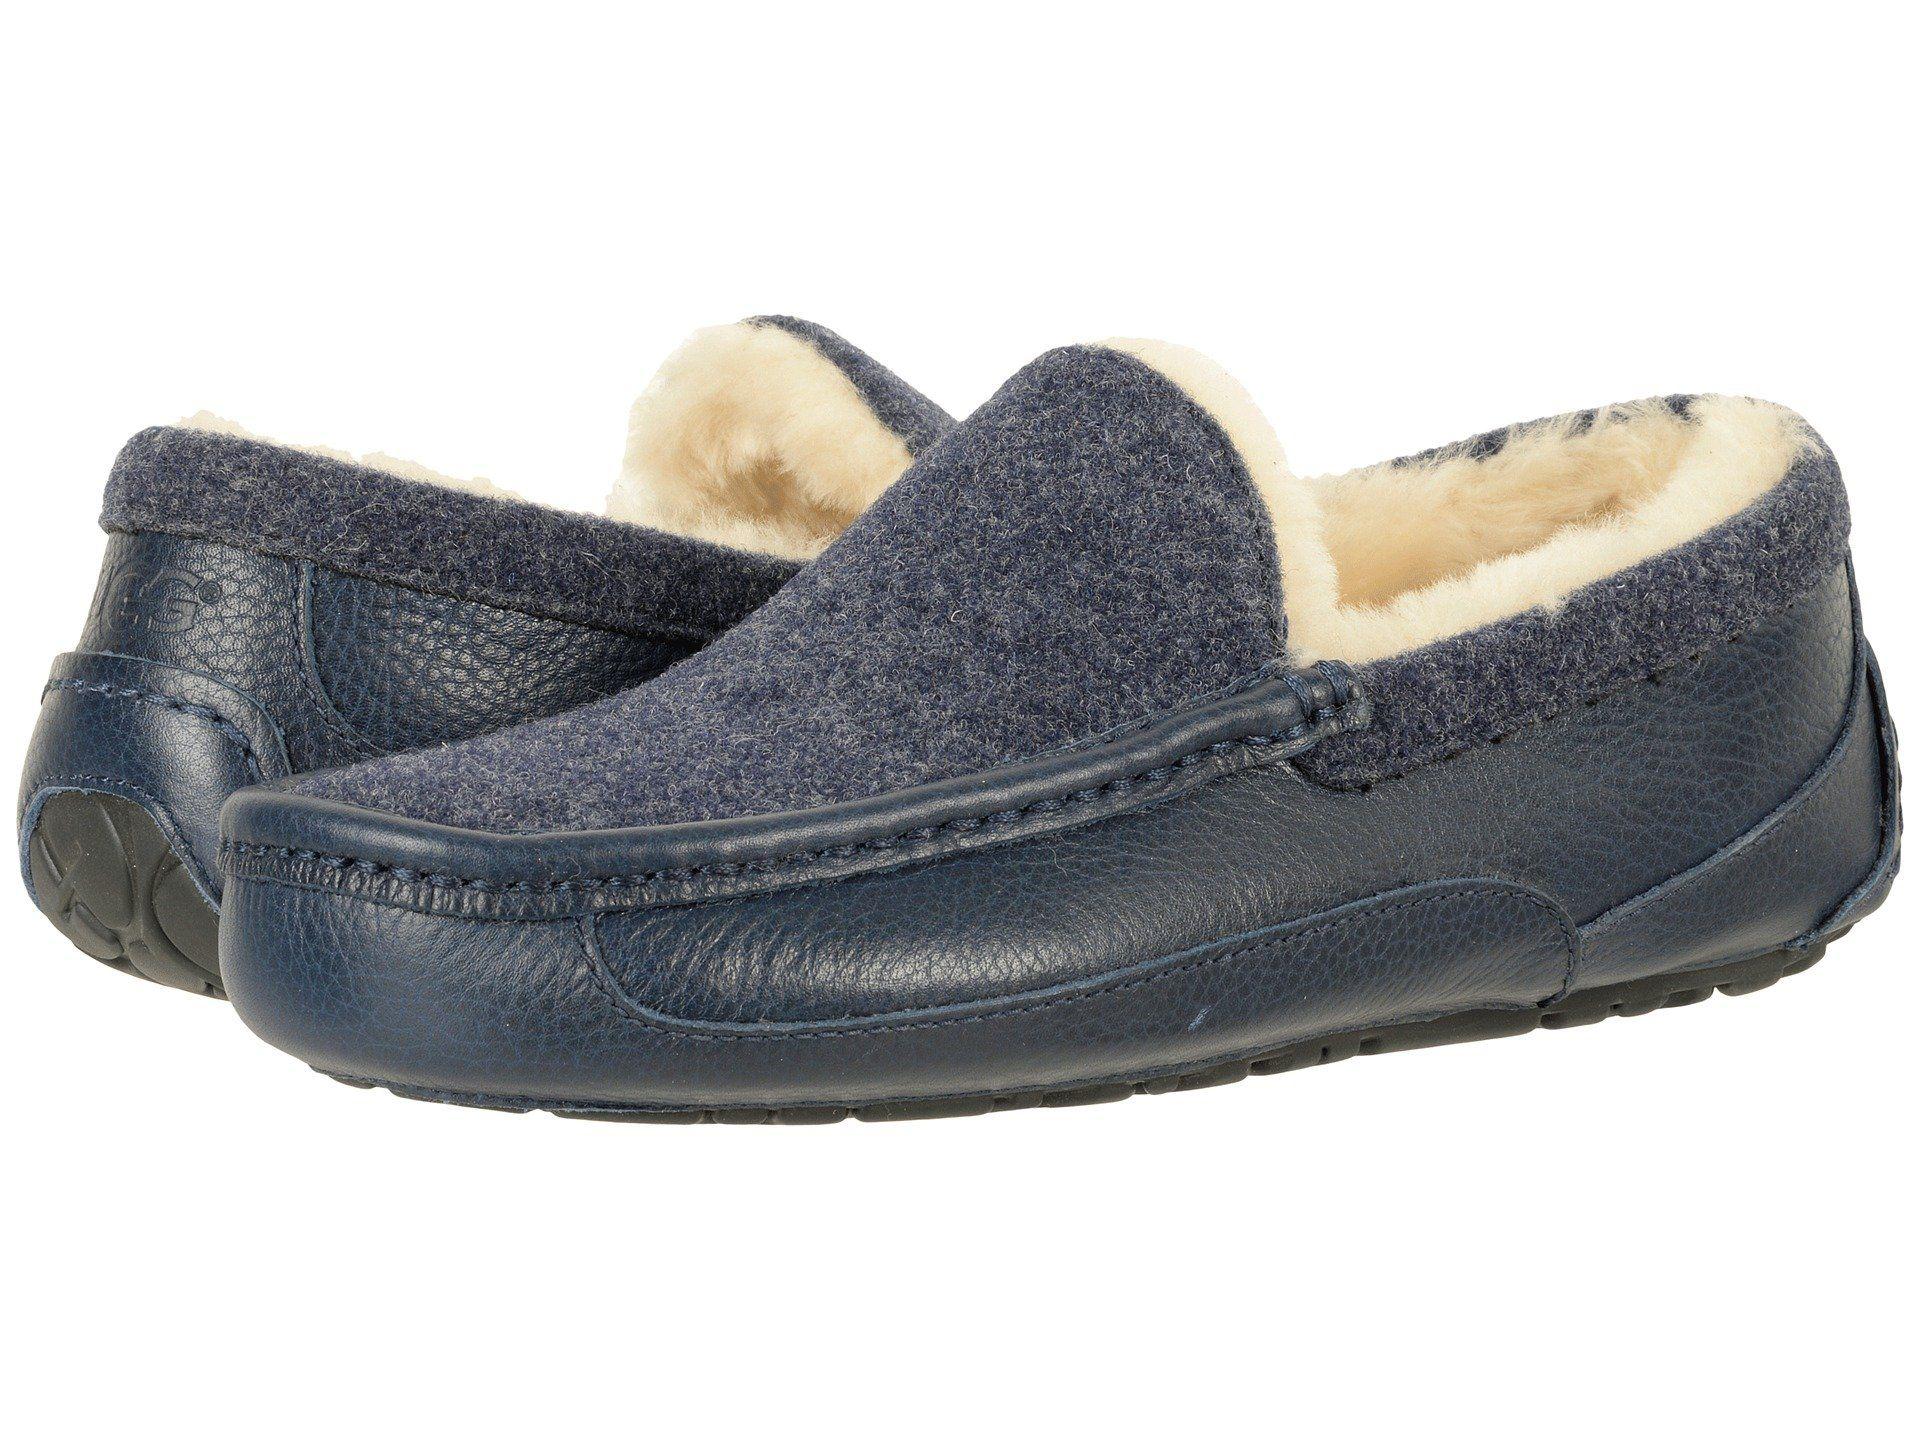 d3da85b4131 UGG Ascot Novelty. #ugg #shoes # | Ugg Men | Ugg ascot, Uggs, Mens ...